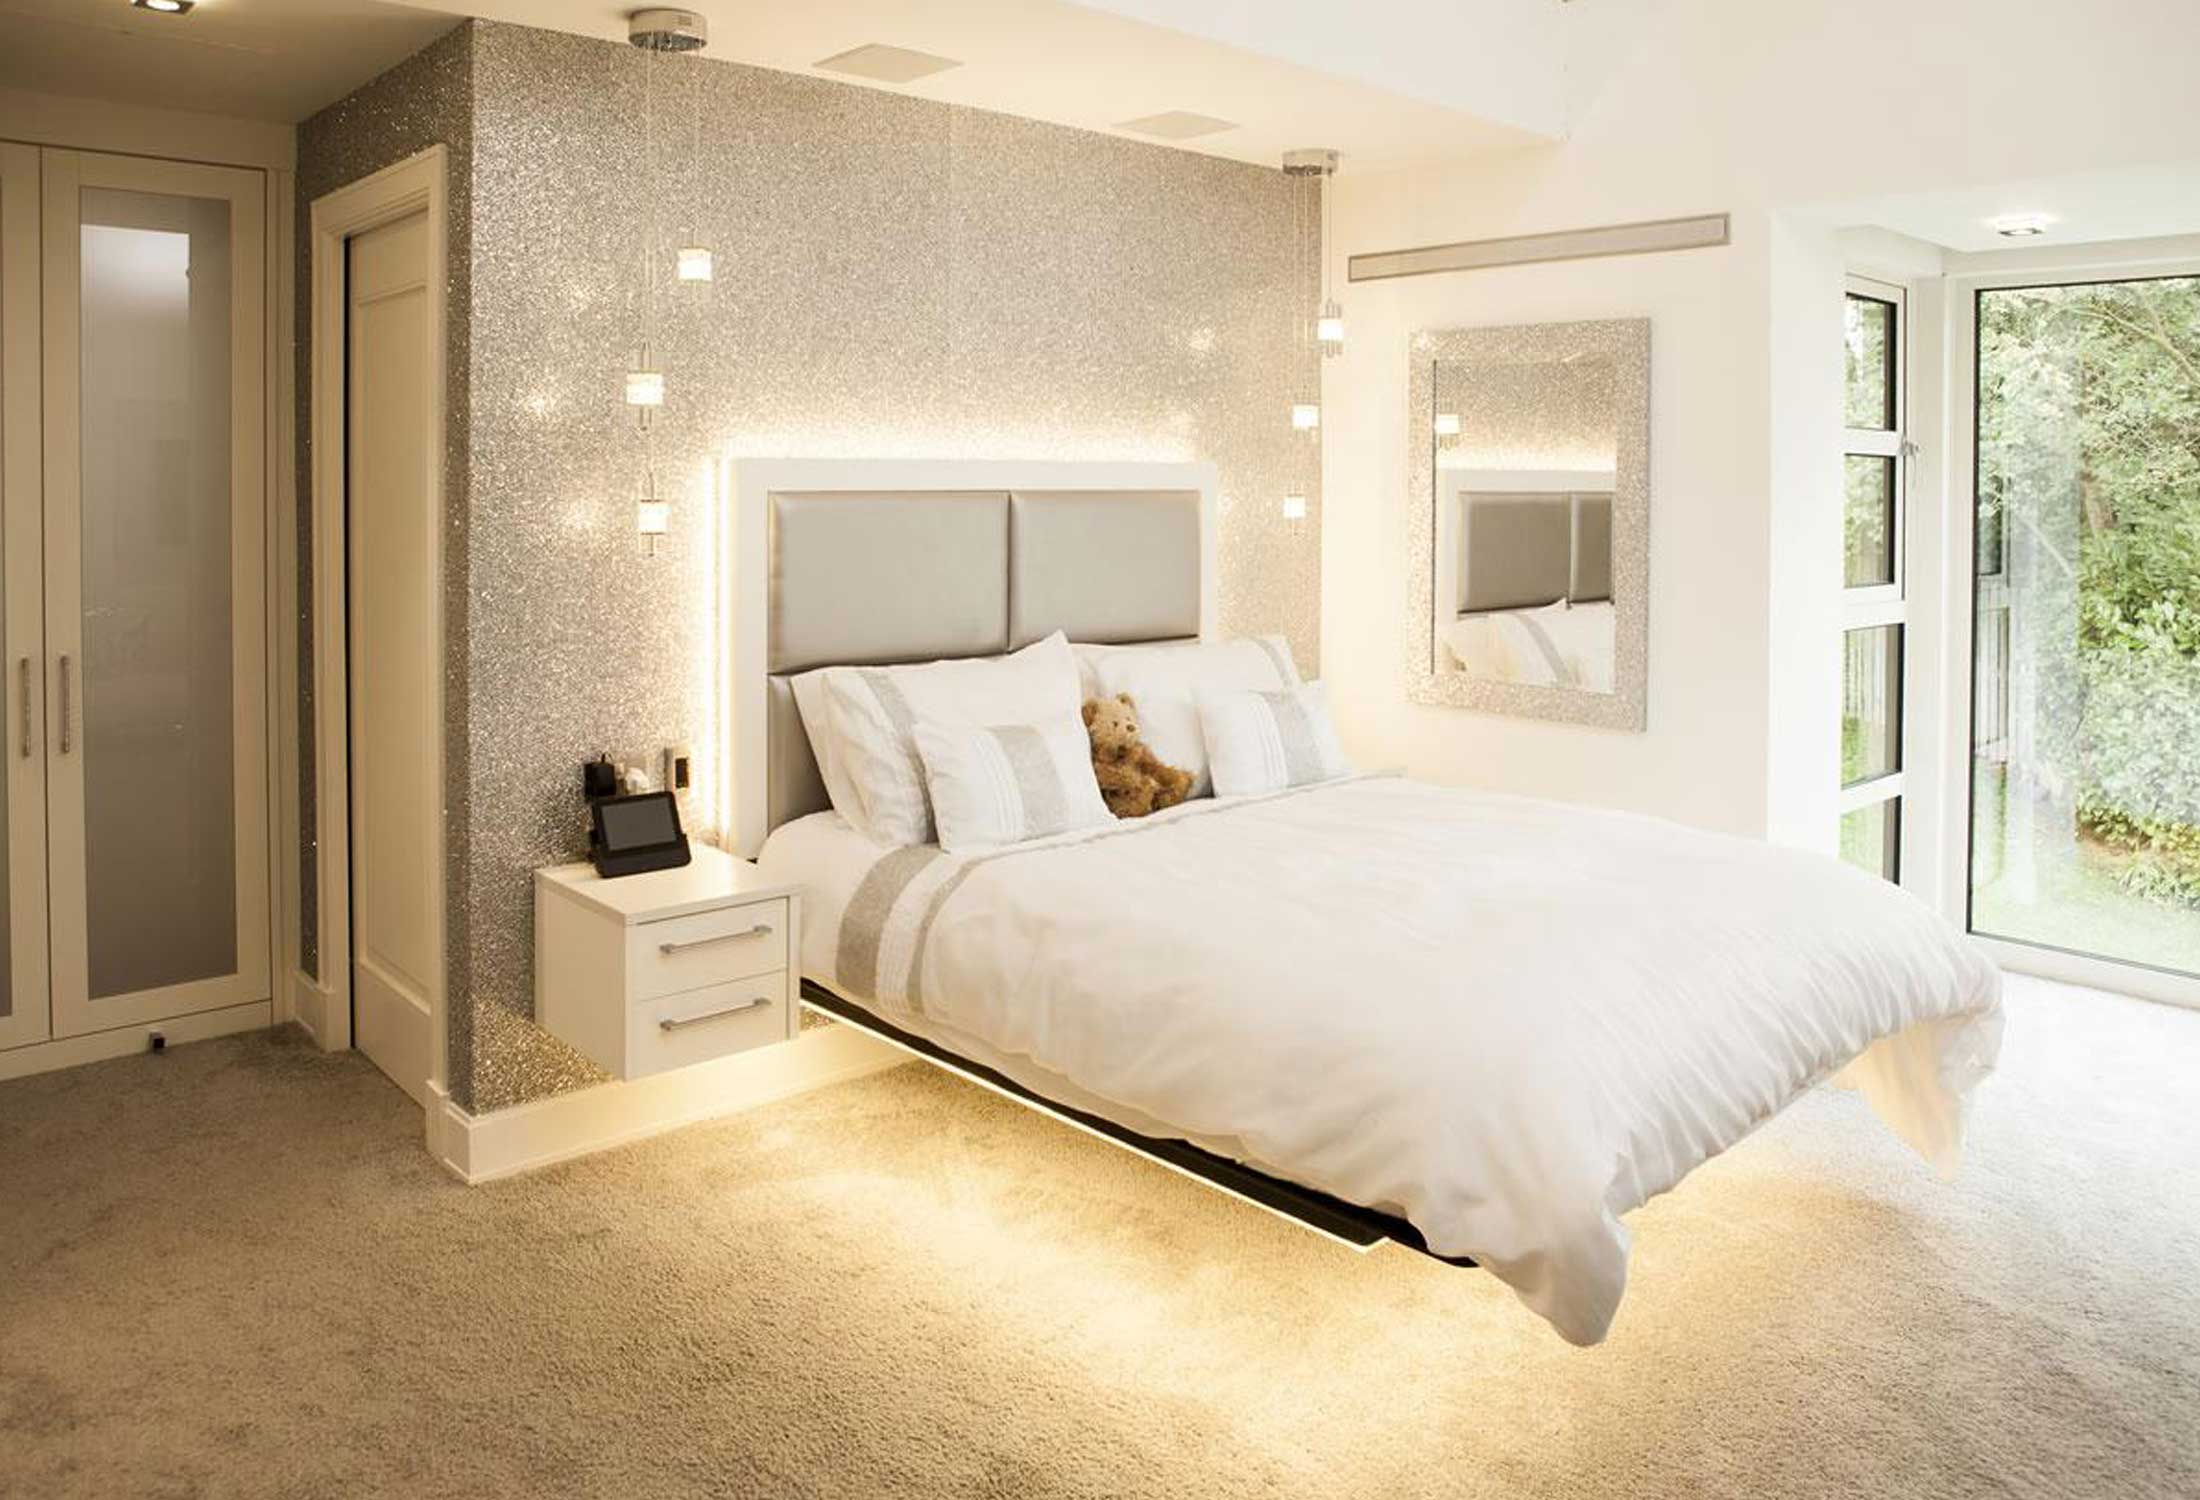 Floating Bed Room